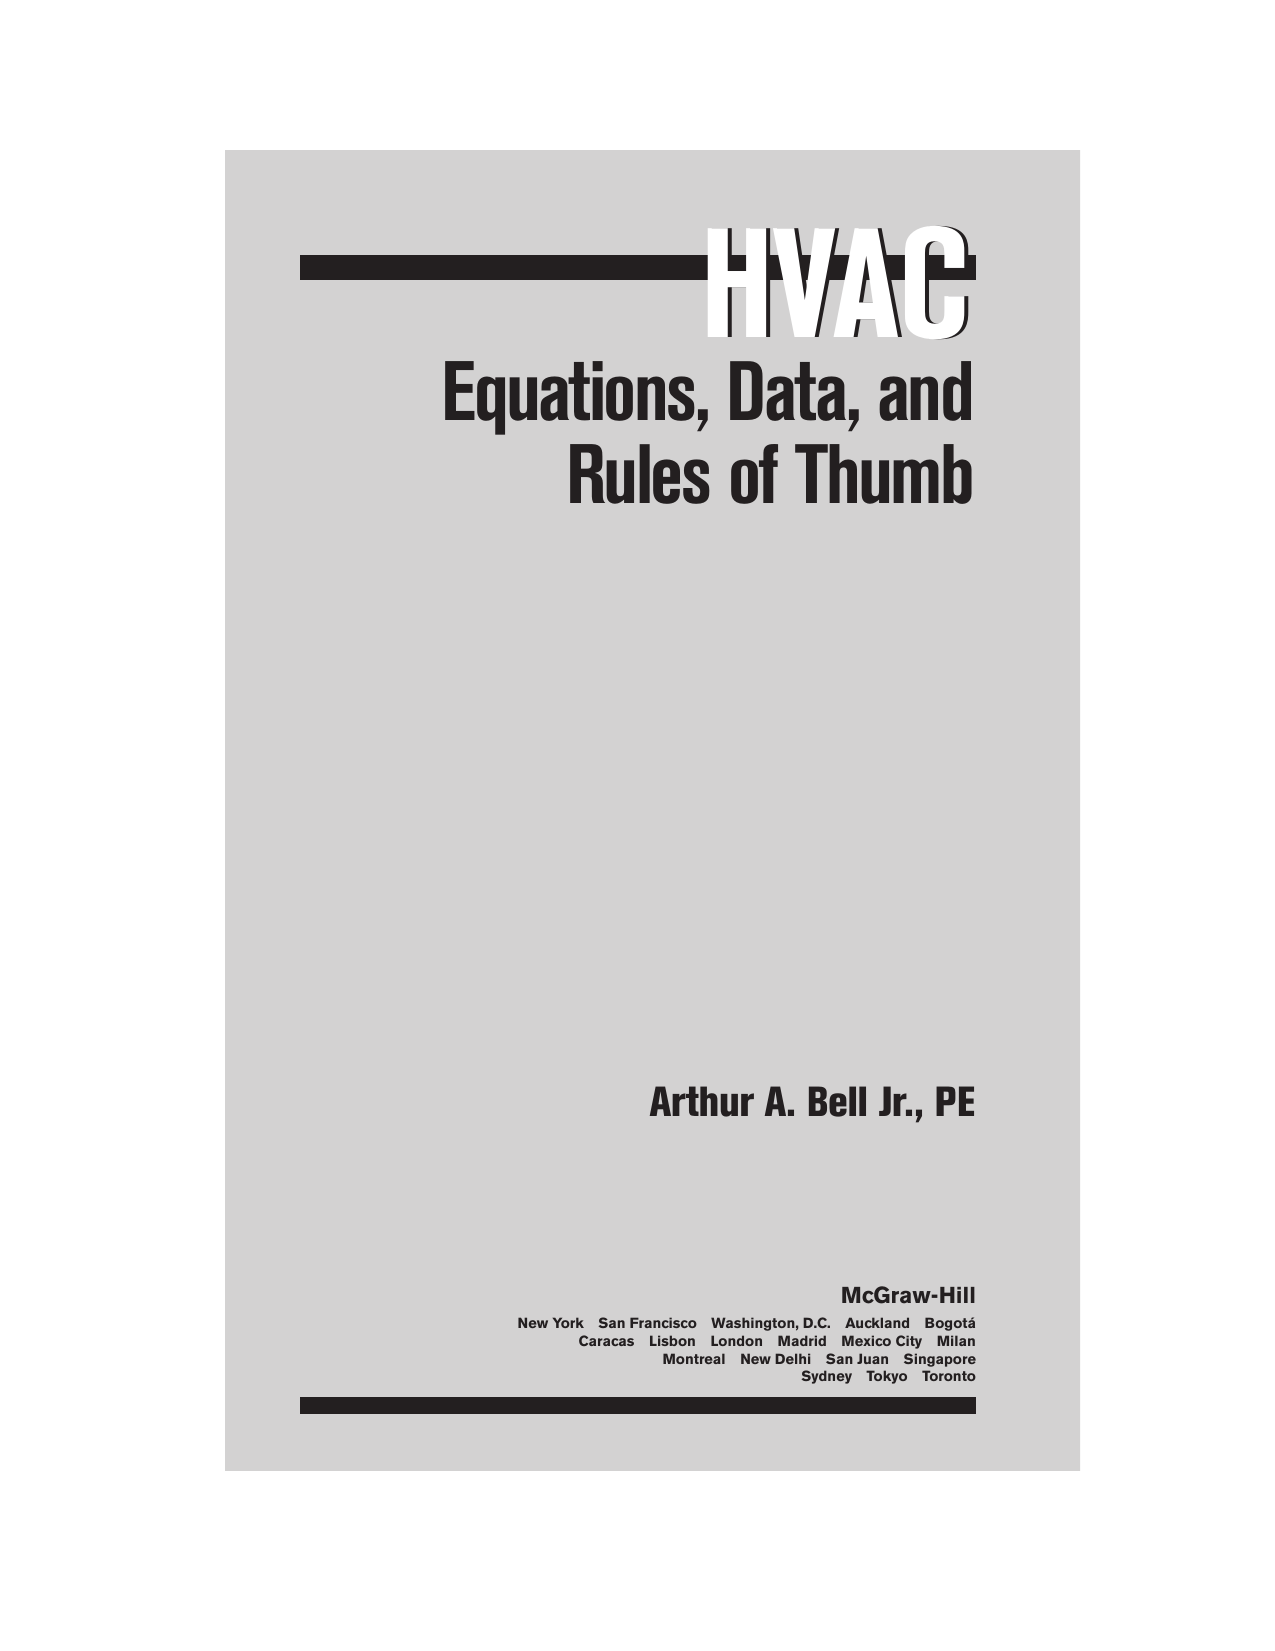 06c2bc8c621 hvac-equations-data-and-rules-of-thumb